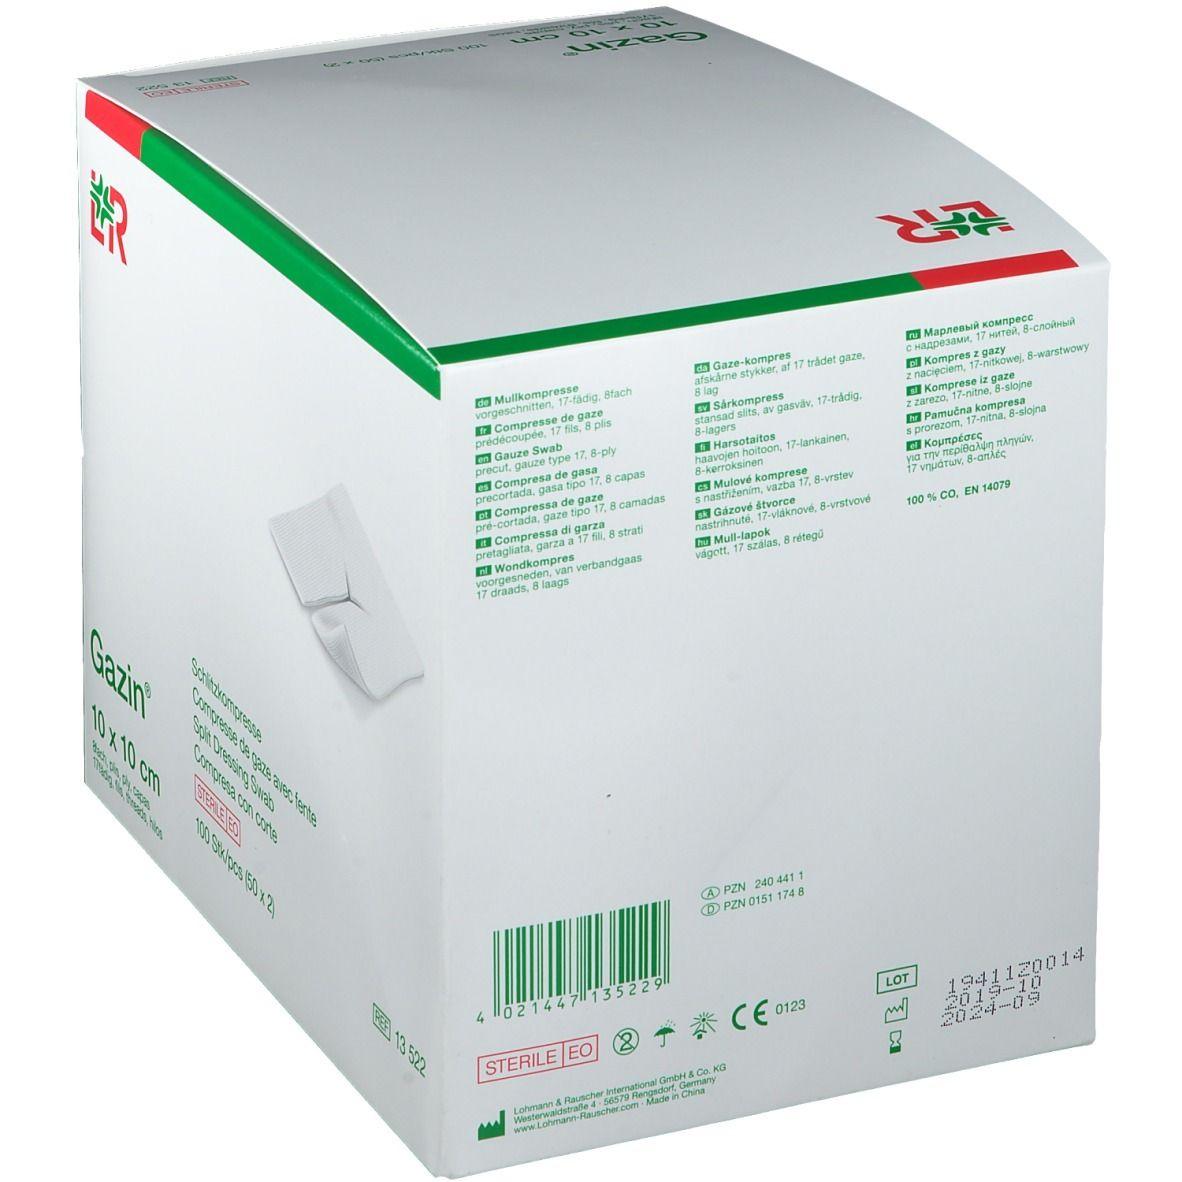 Gazin® Schlitzkompresse 10 cm x 10 cm steril 8 lagig